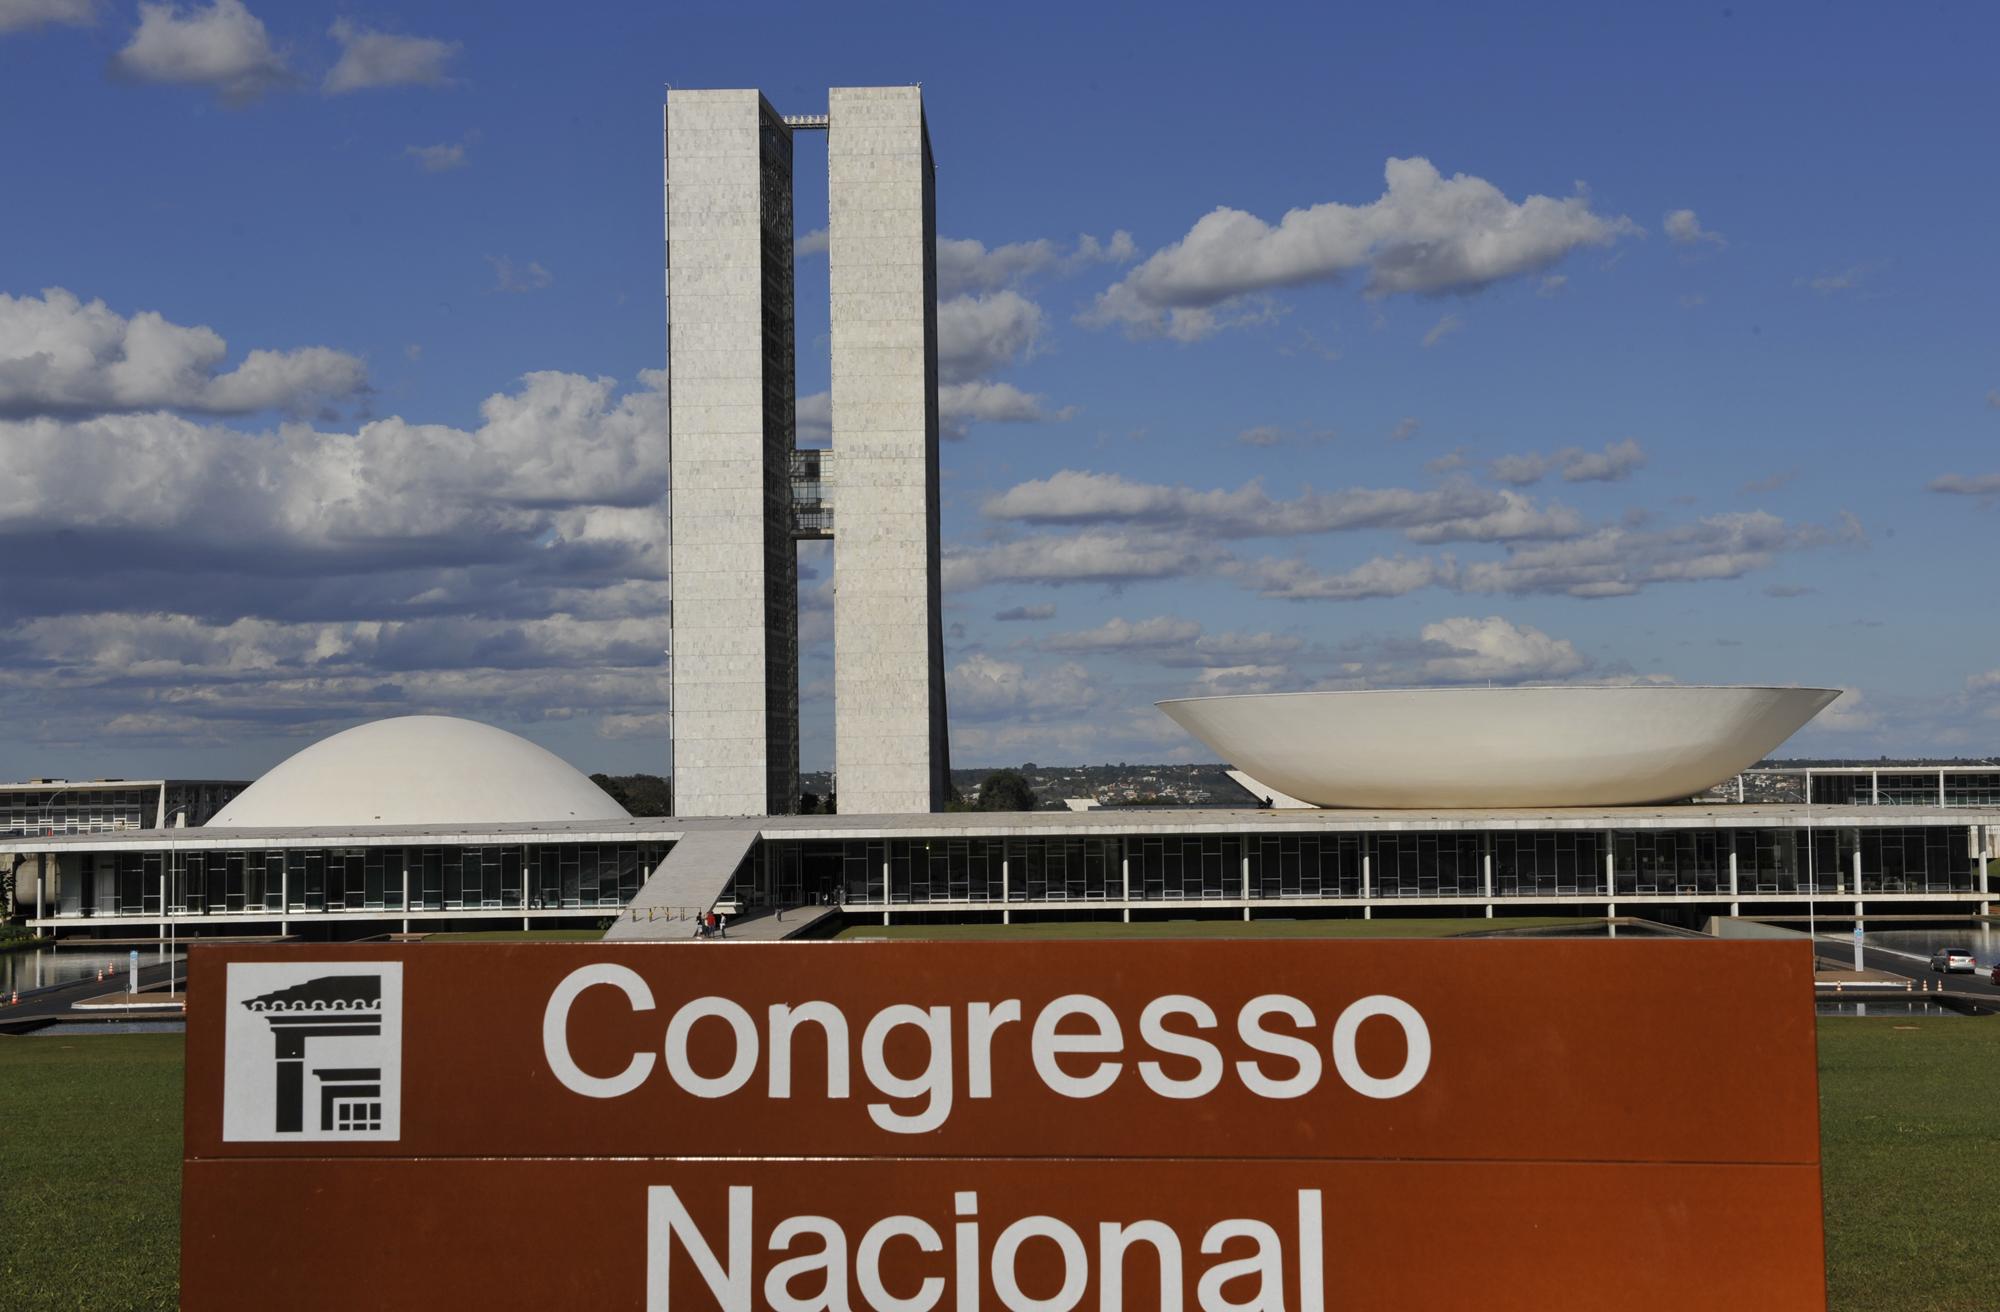 Brasília - Congresso - Congresso Nacional placa